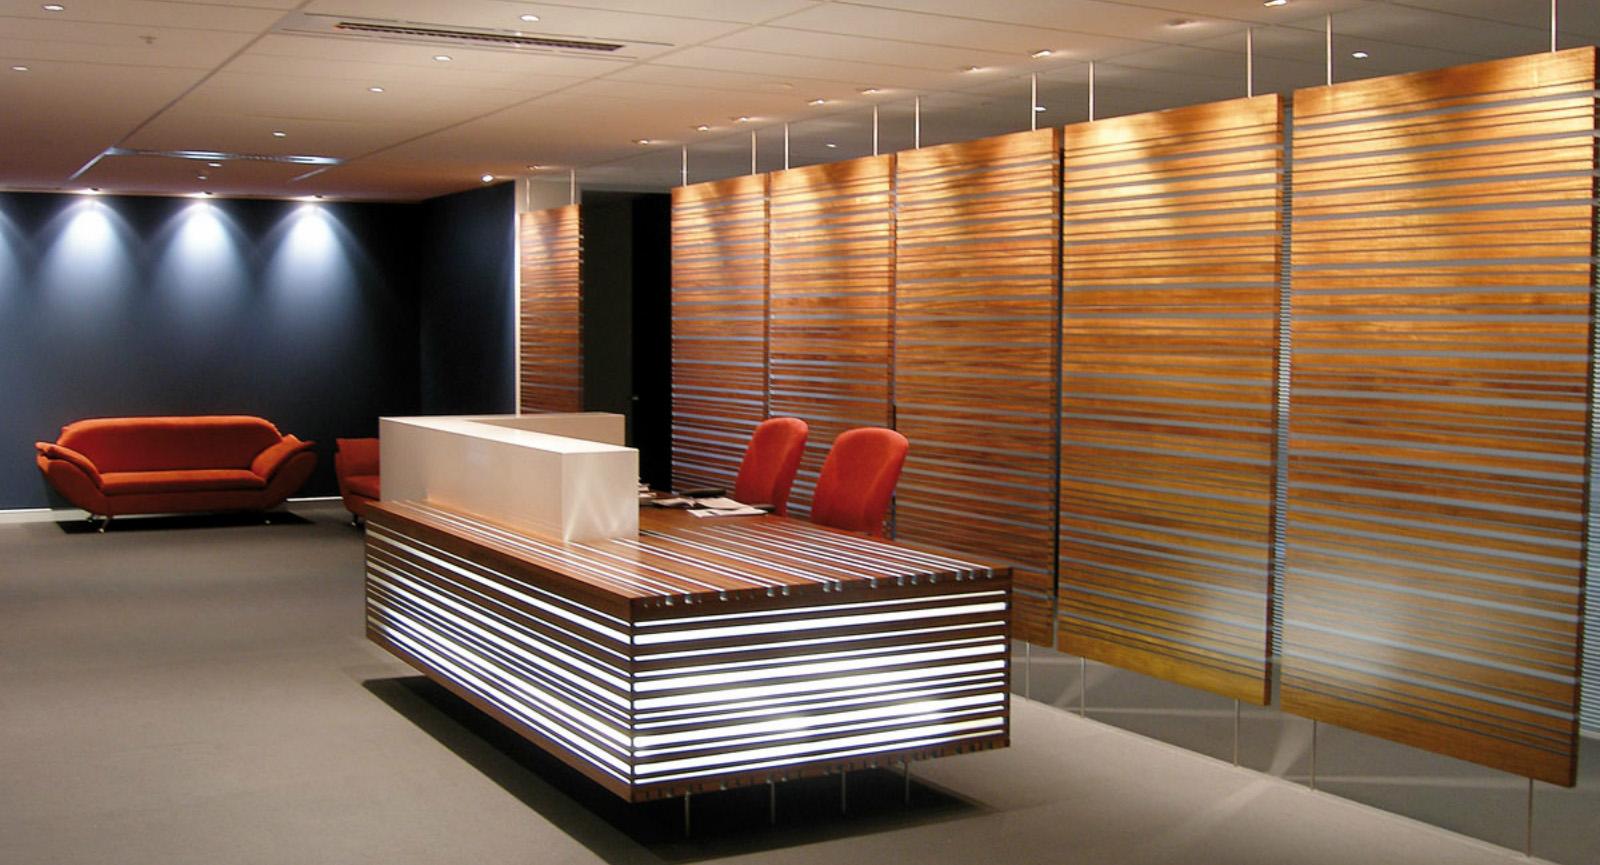 Wood Paneling Interior Walls